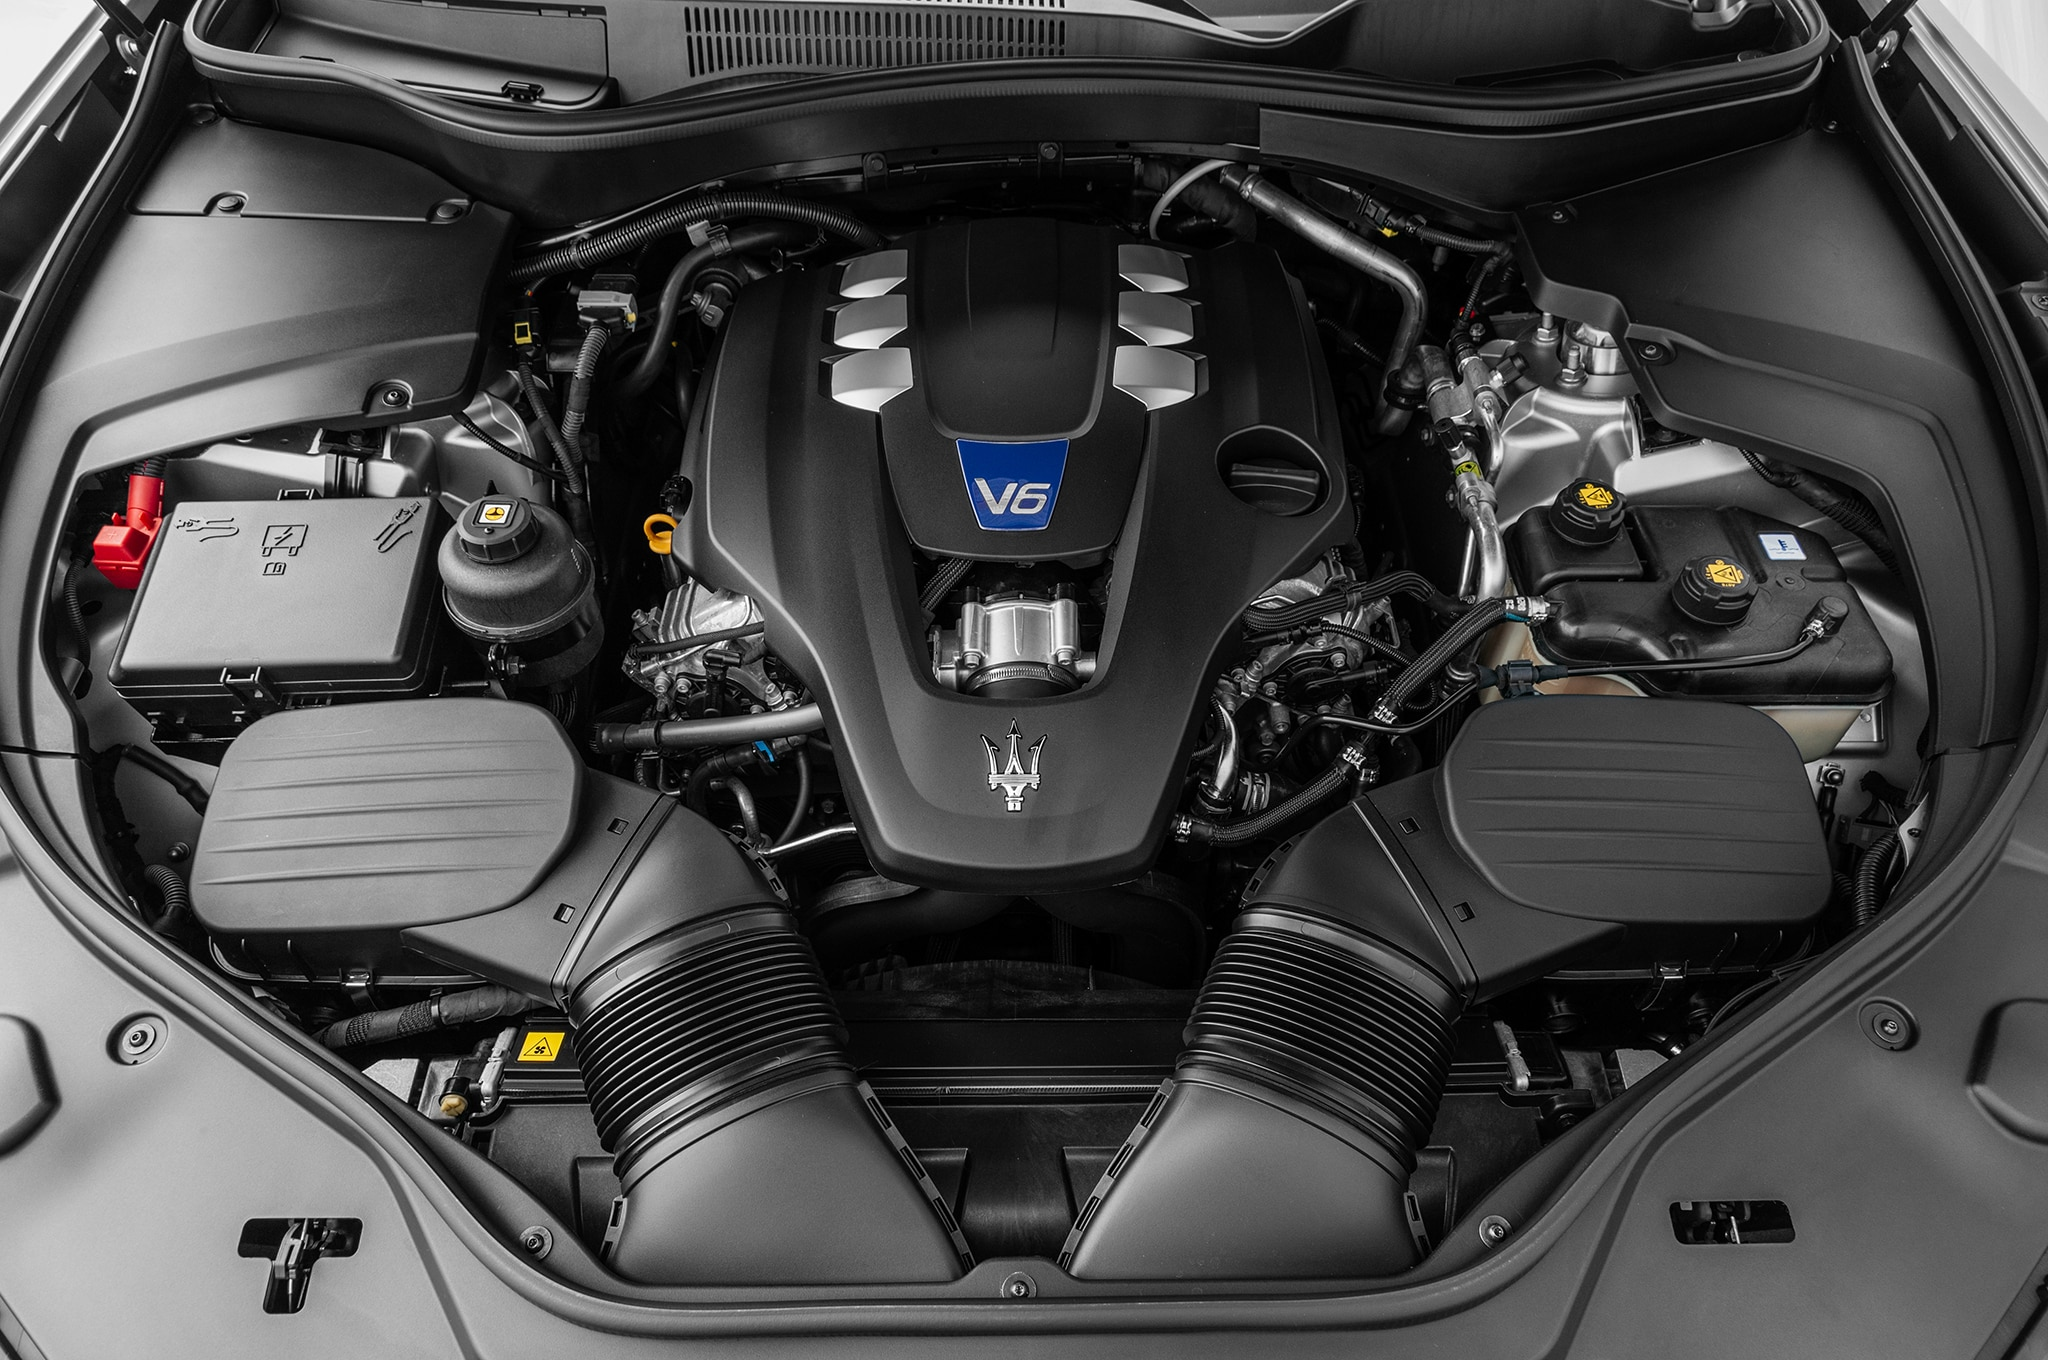 2017 maserati levante sq4 engine - motor trend en español